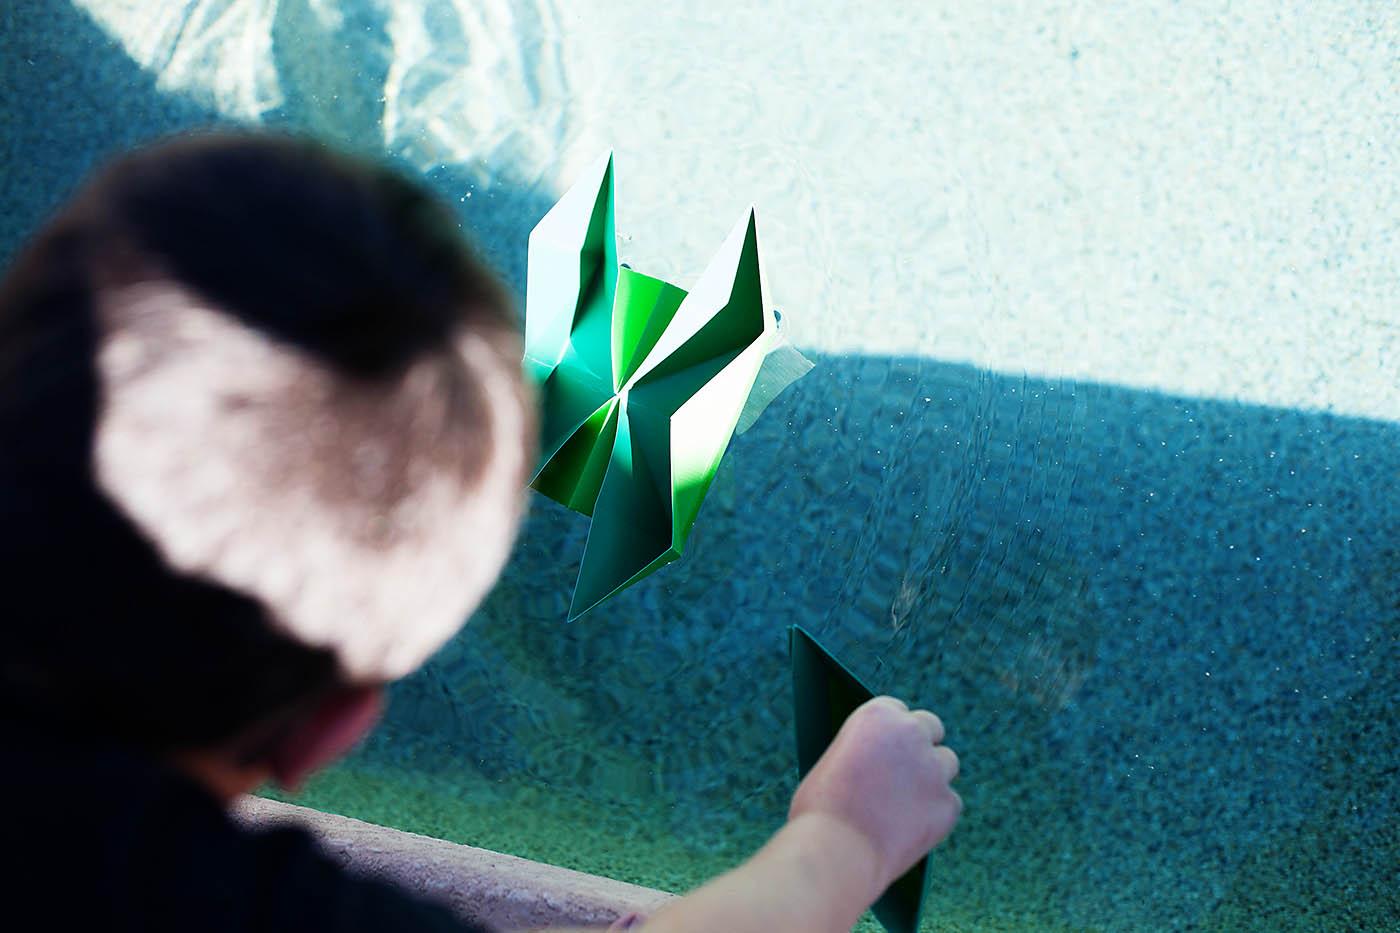 DIY folded floating catamaran!